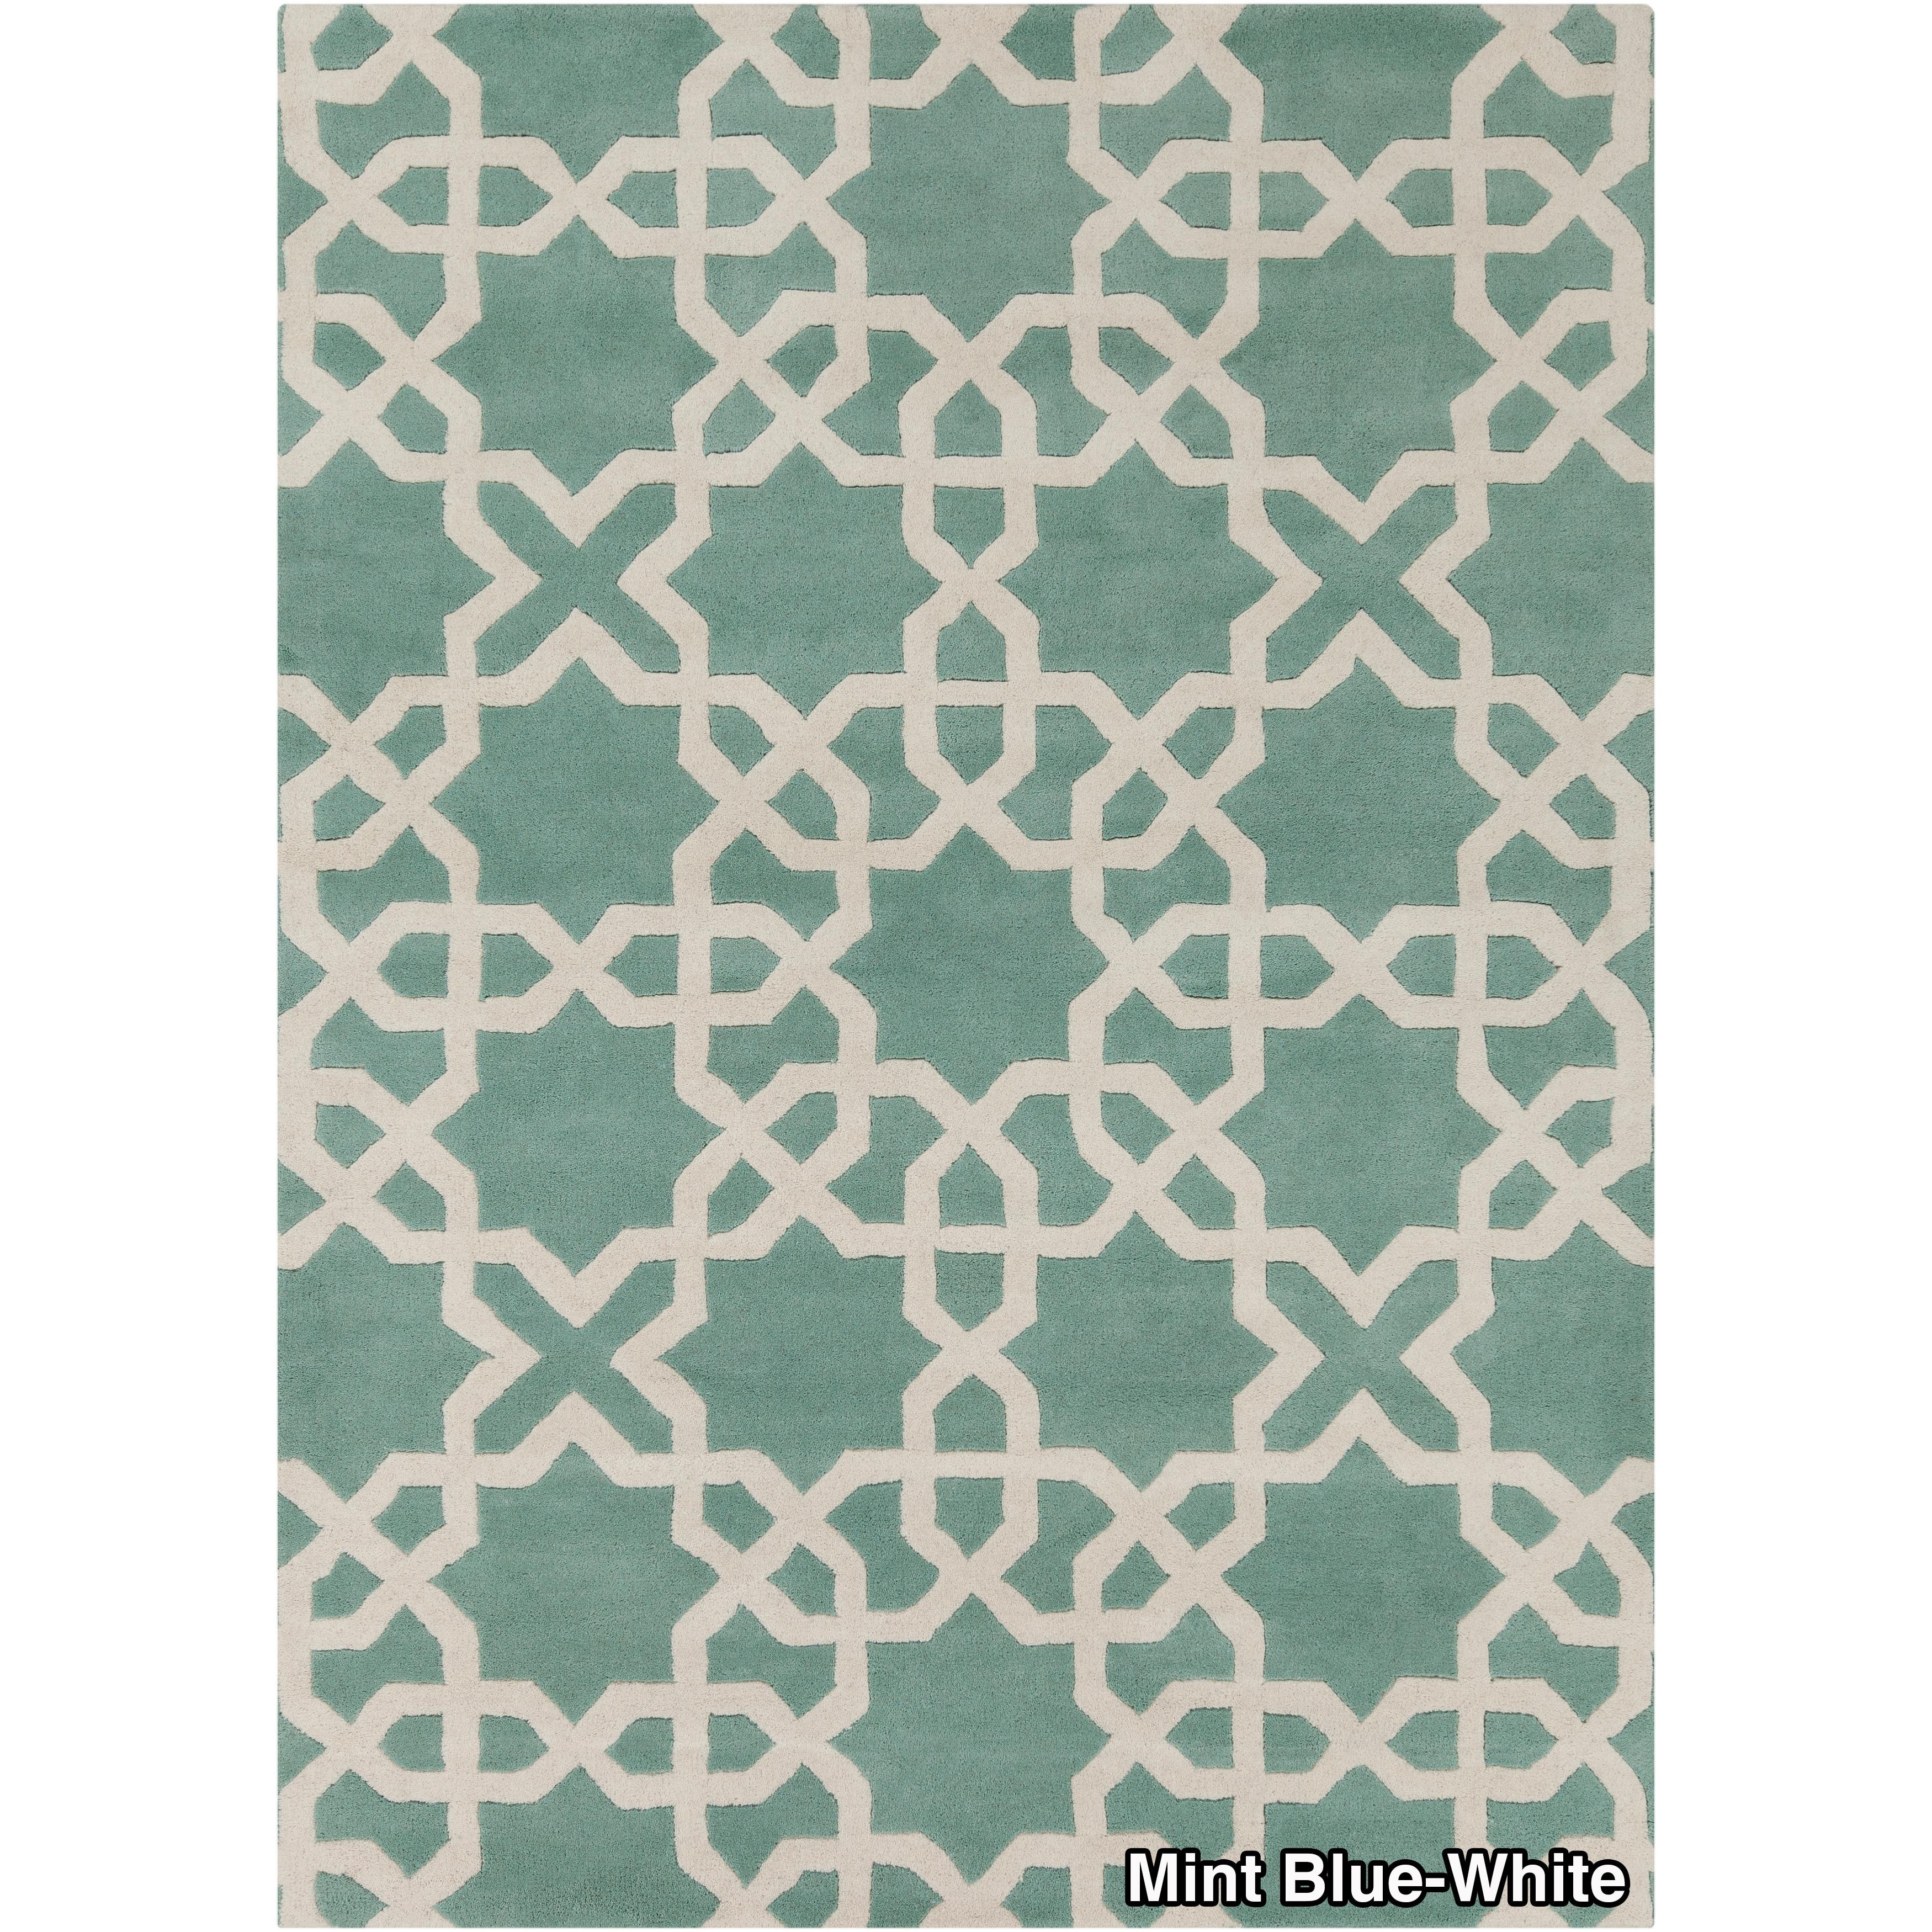 artist's loom handtufted moroccan geometric wool rug ('x')  freeshipping today  overstockcom  . artist's loom handtufted moroccan geometric wool rug ('x